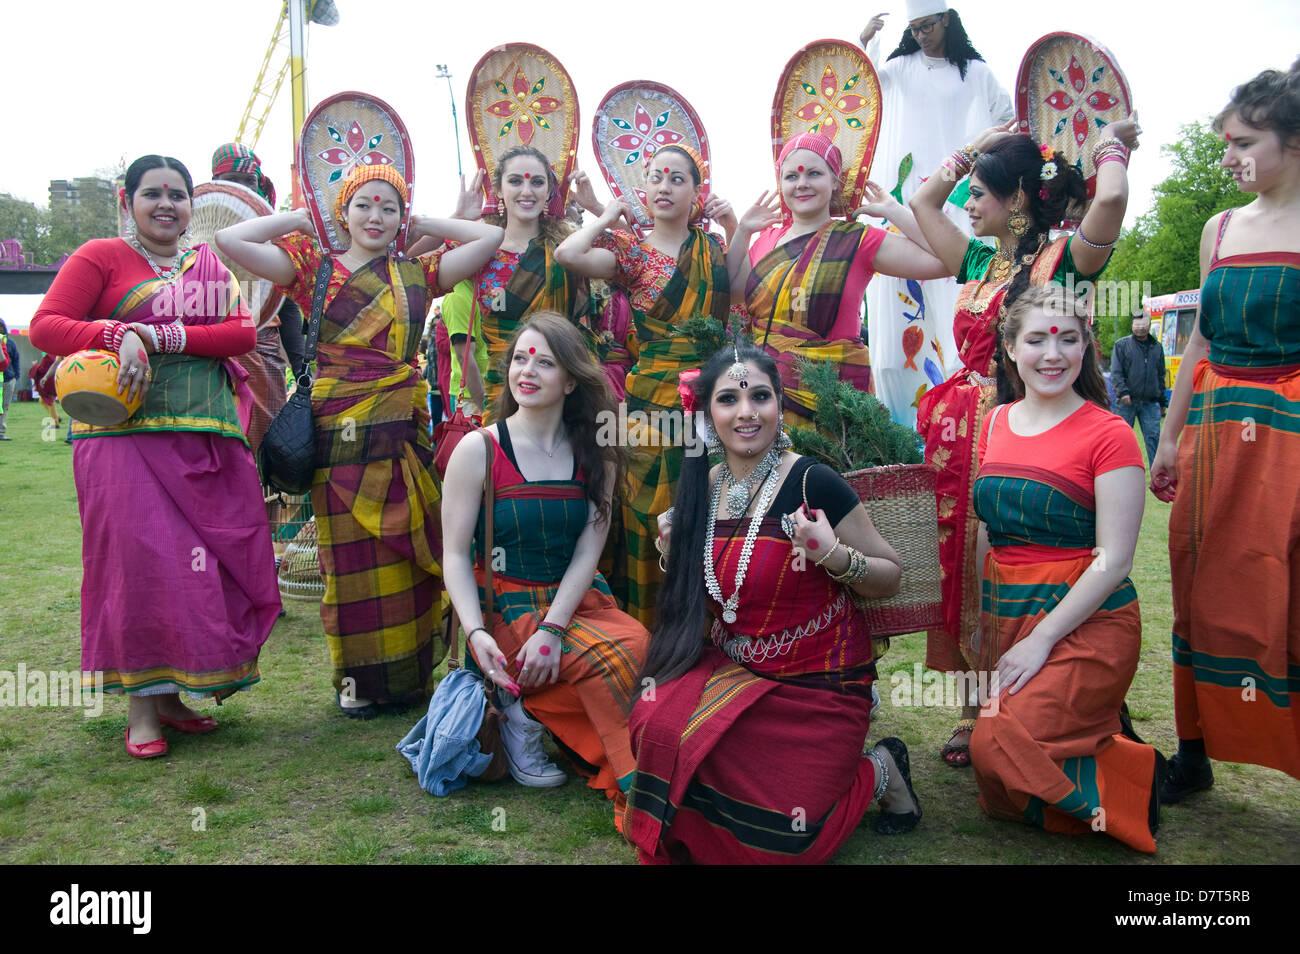 bengali dating london